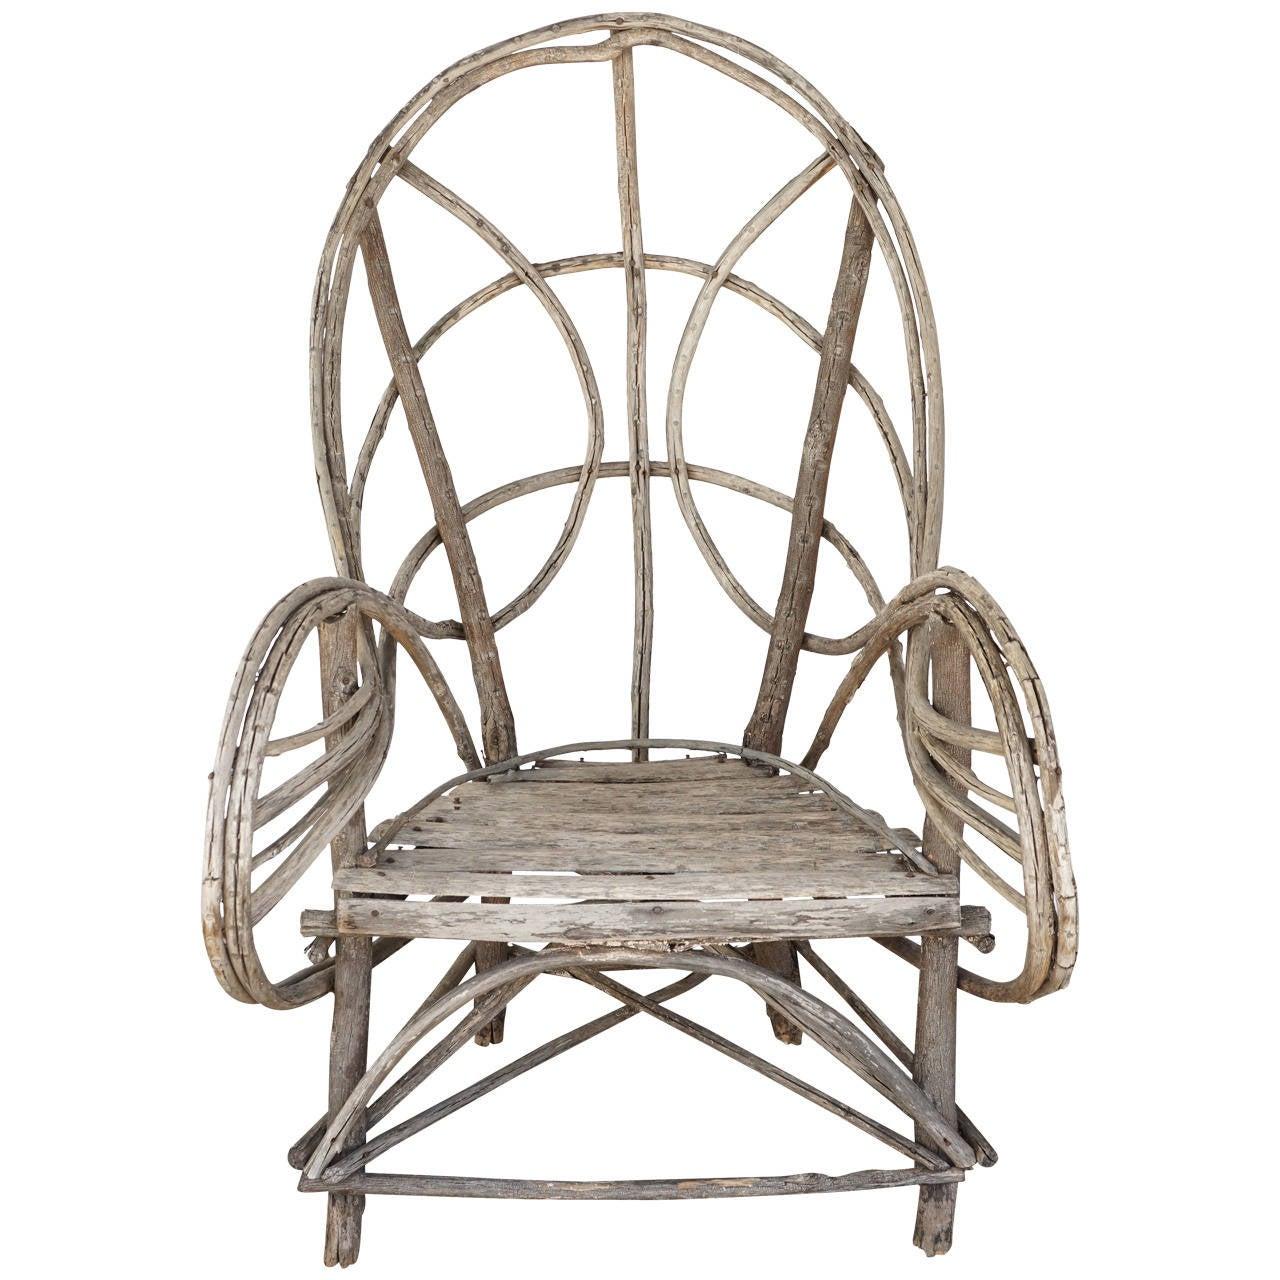 Vintage Adirondack Twig Veranda or Lawn Chair